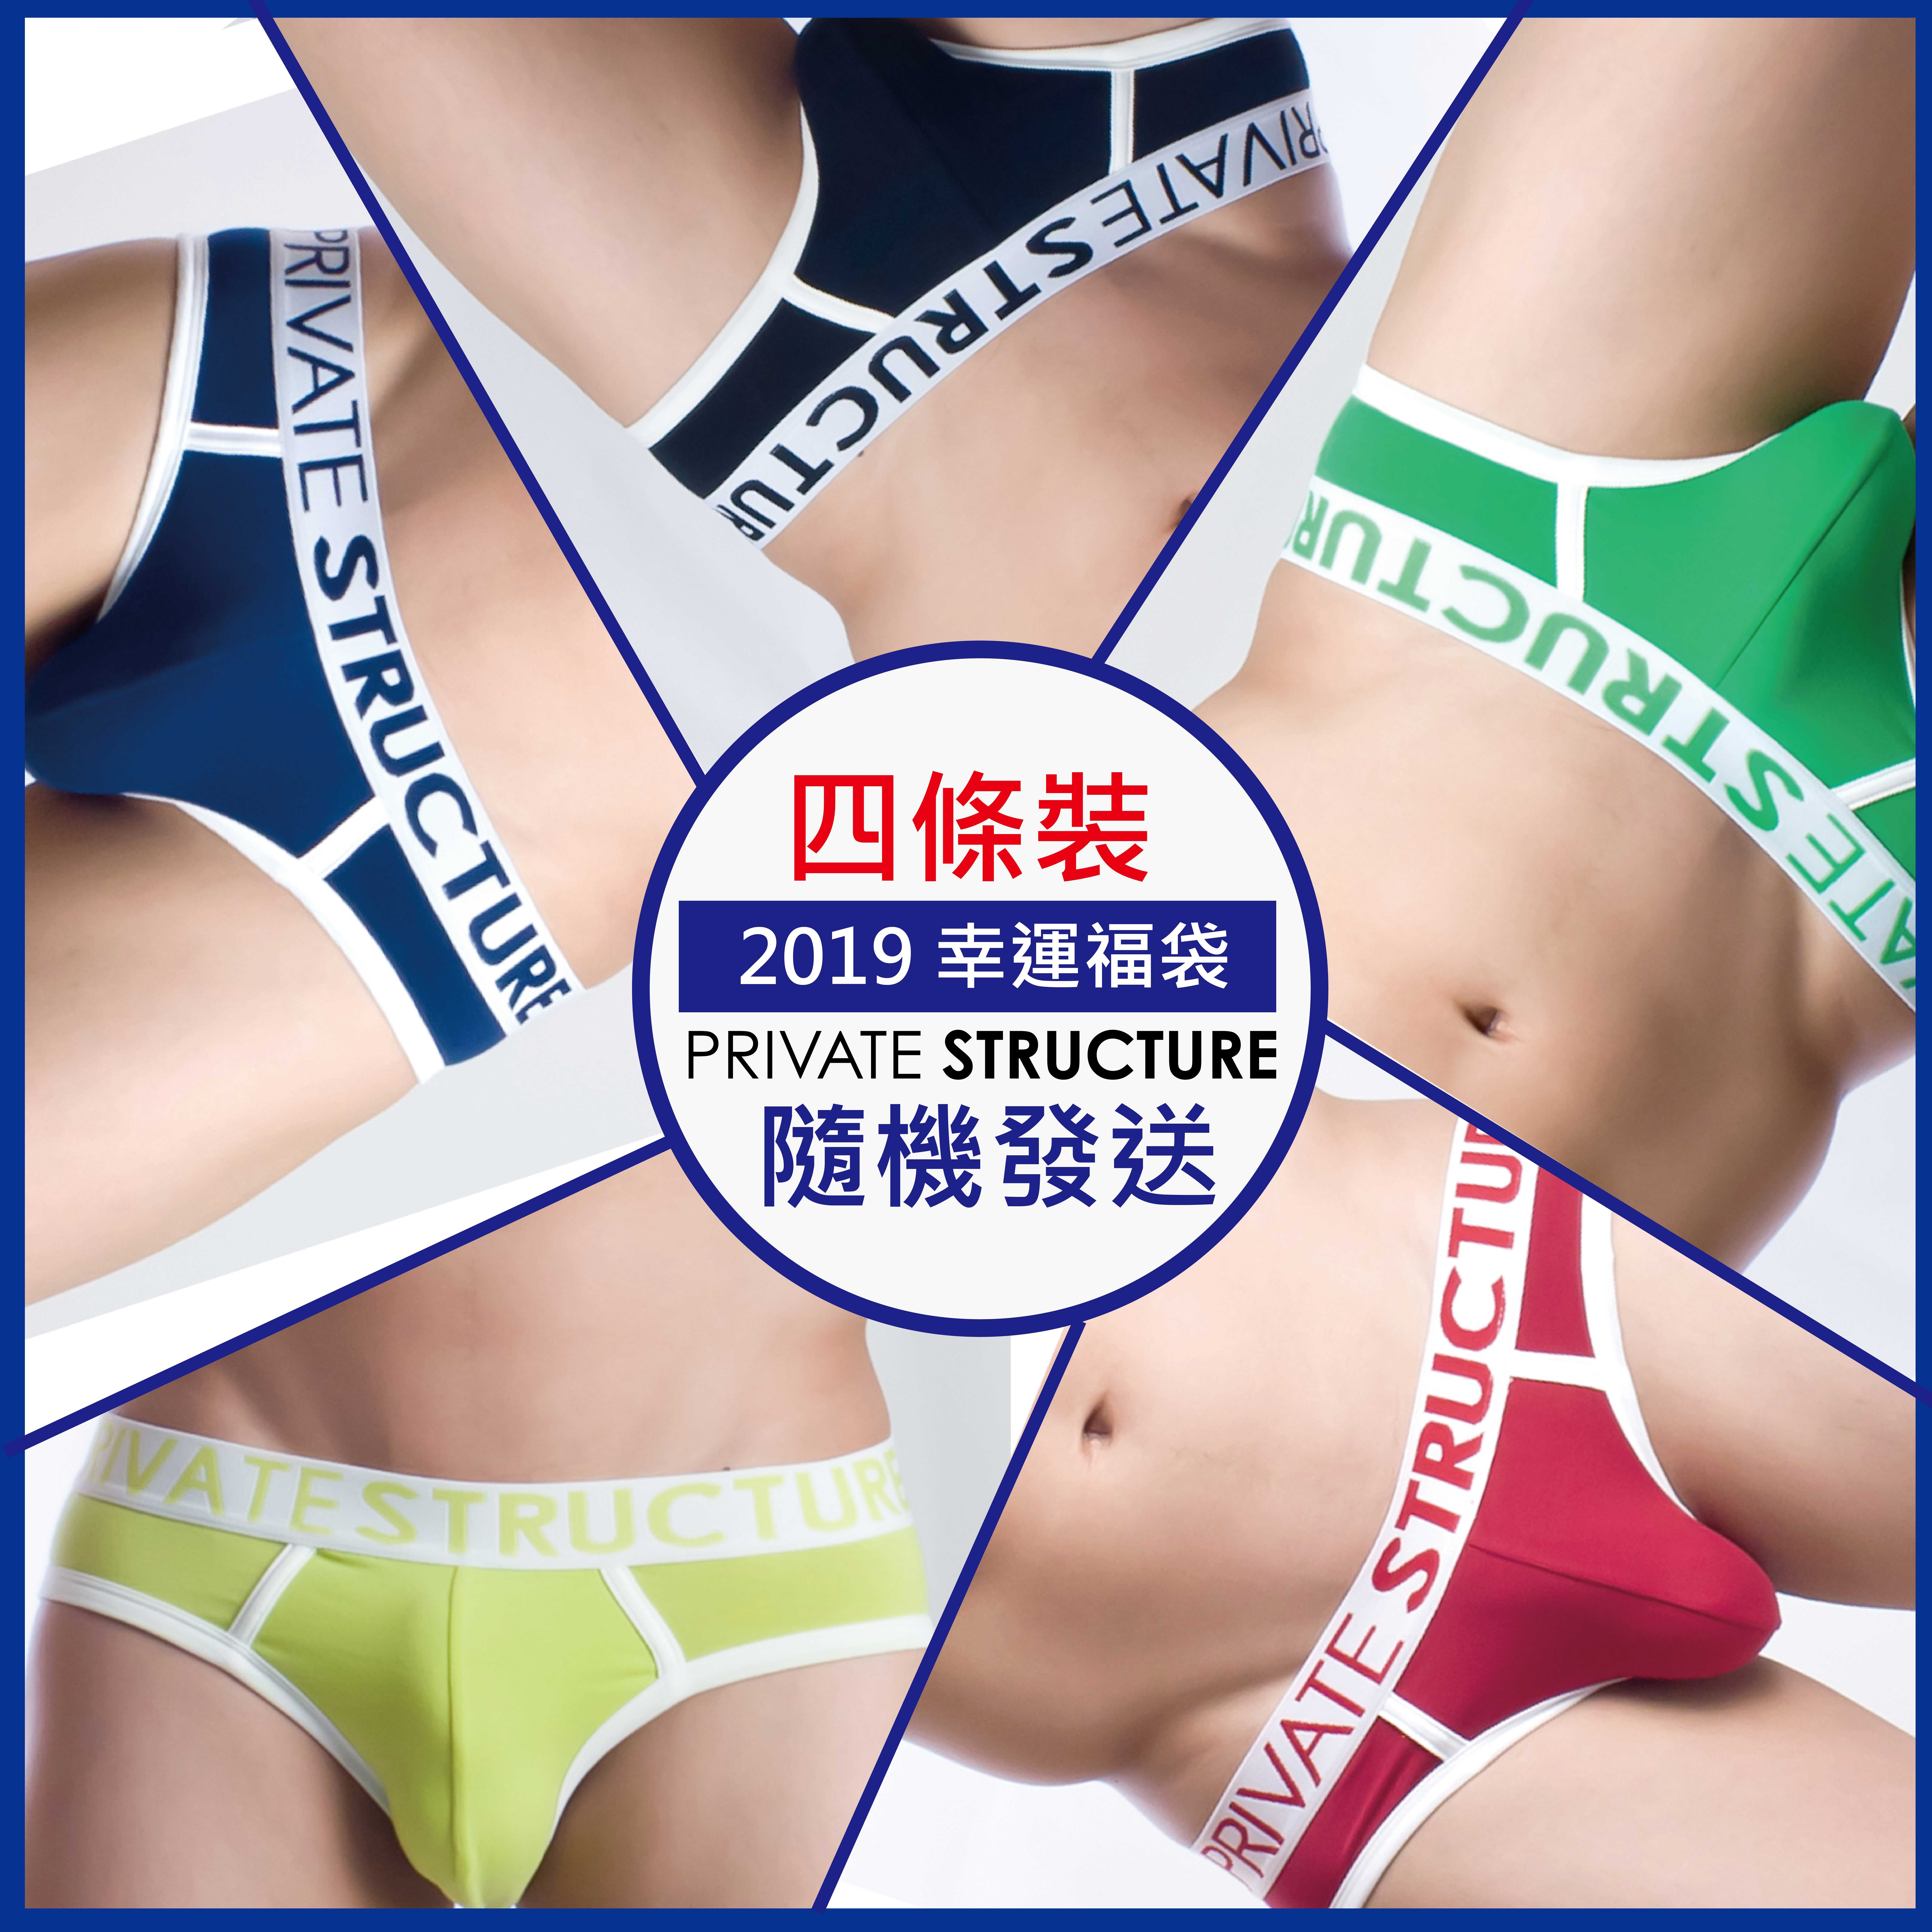 Spectrum 立體三角/平腳內褲 (隨機4件裝)